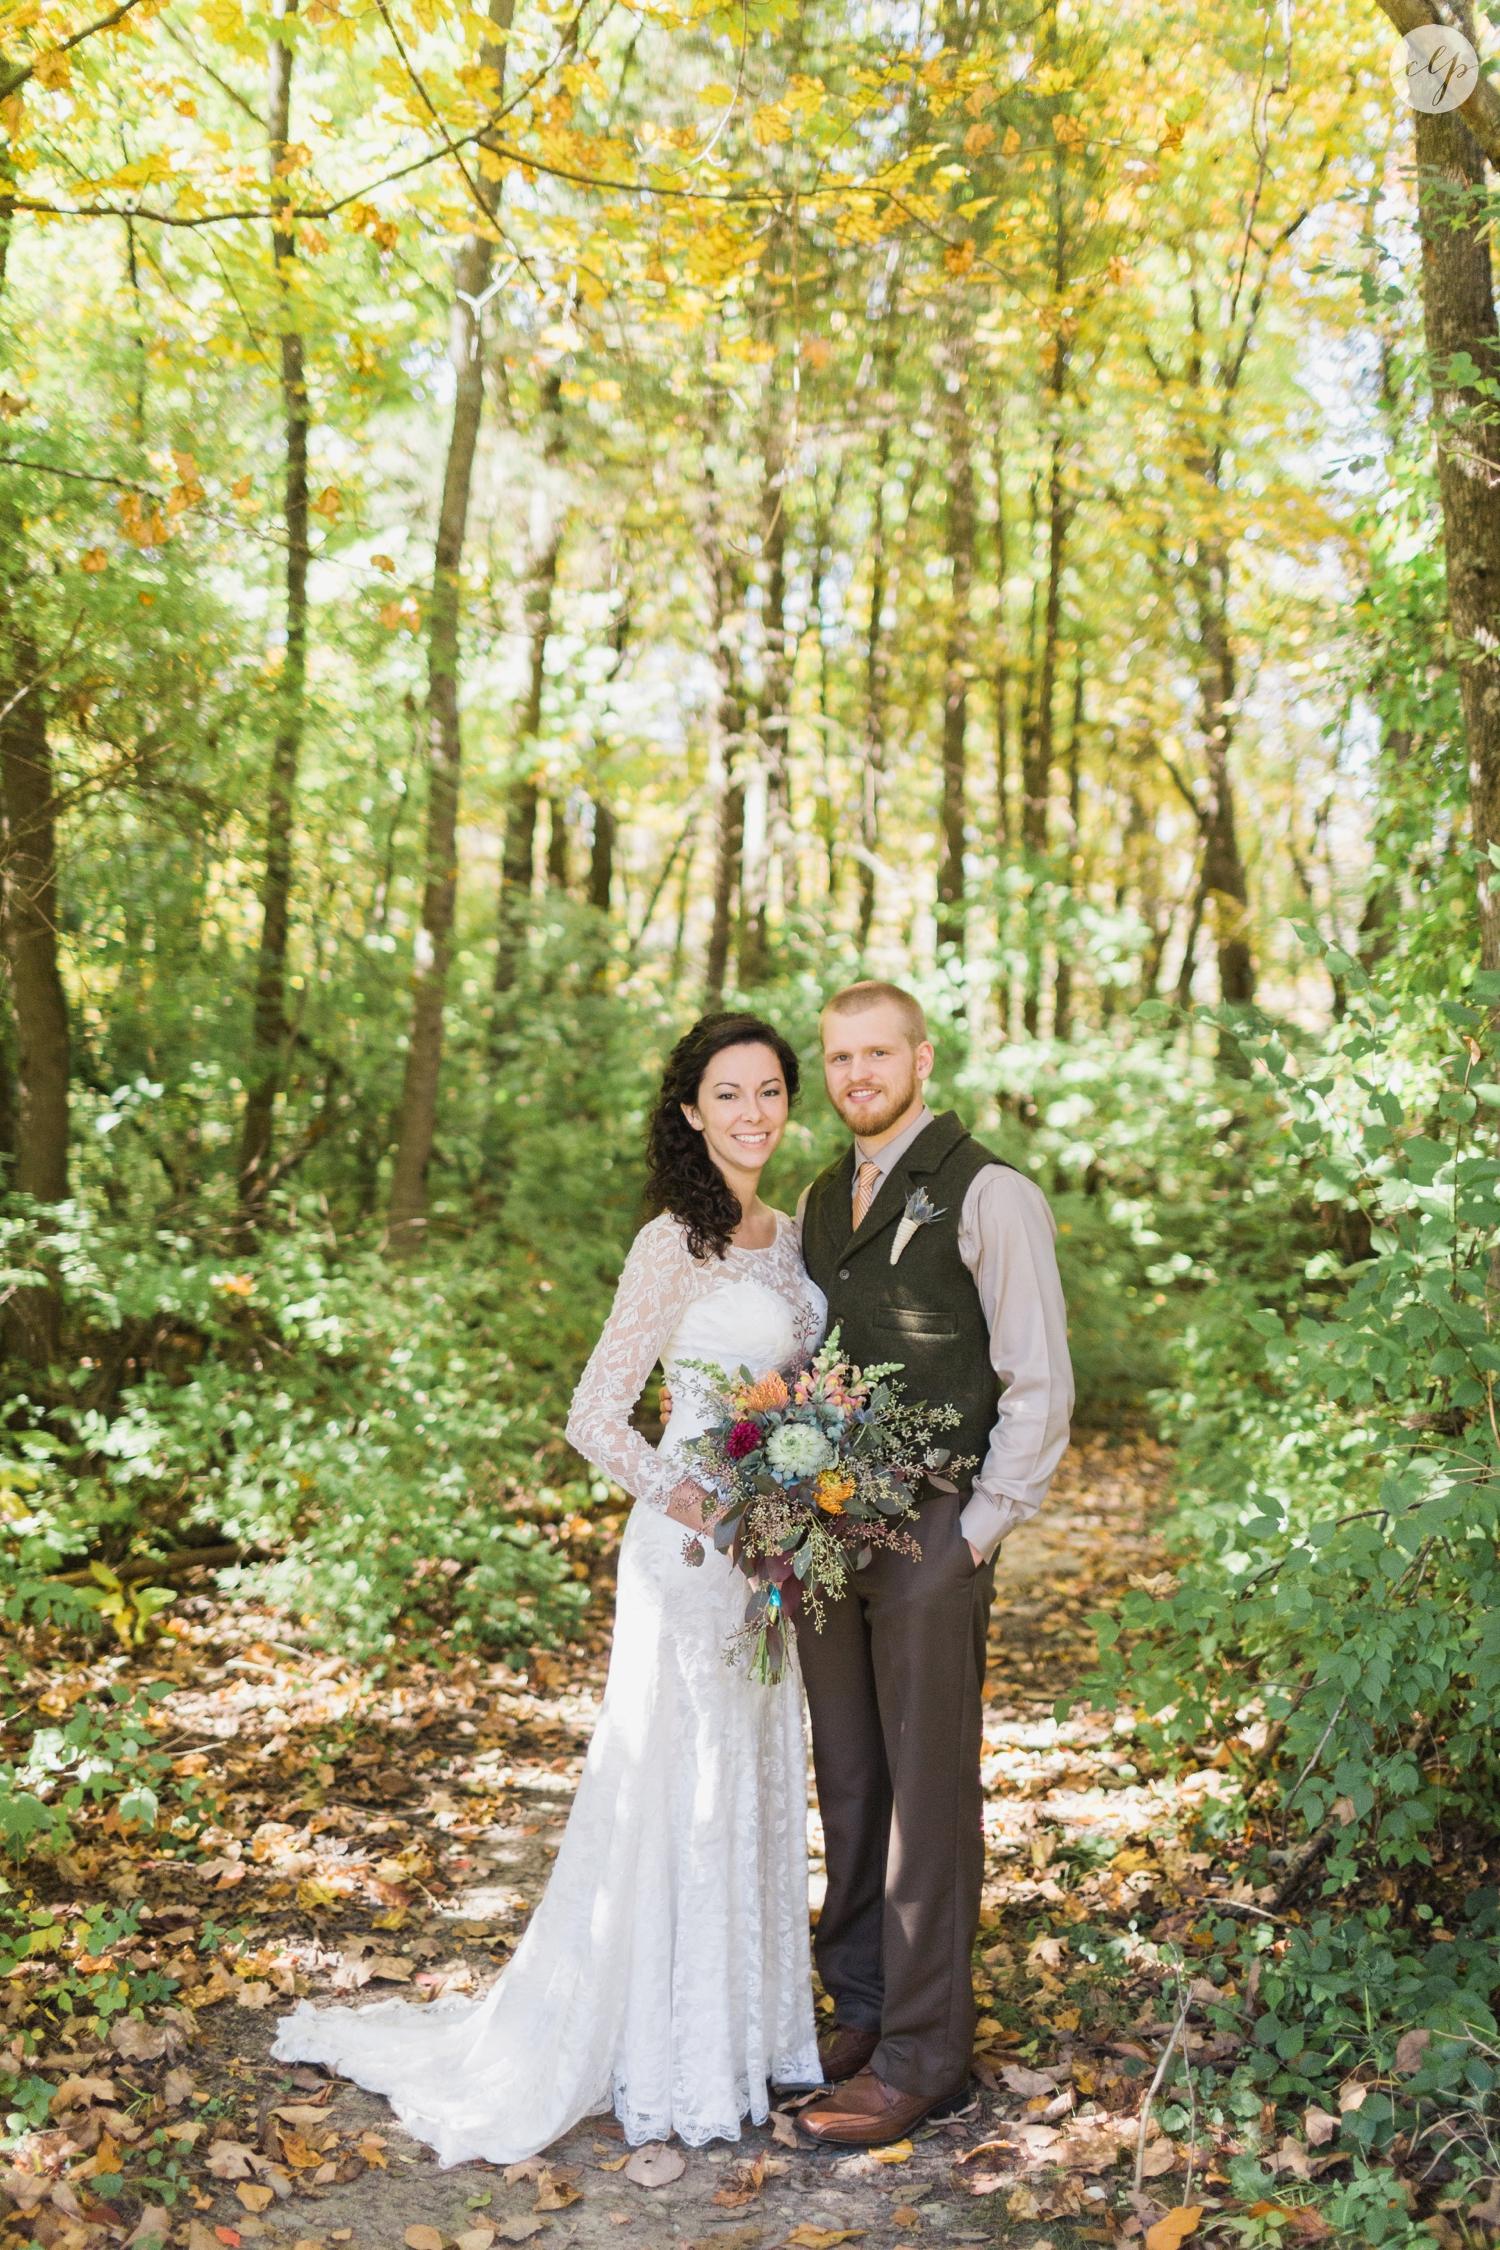 Outdoor-Wedding-in-the-Woods-Photography_4233.jpg